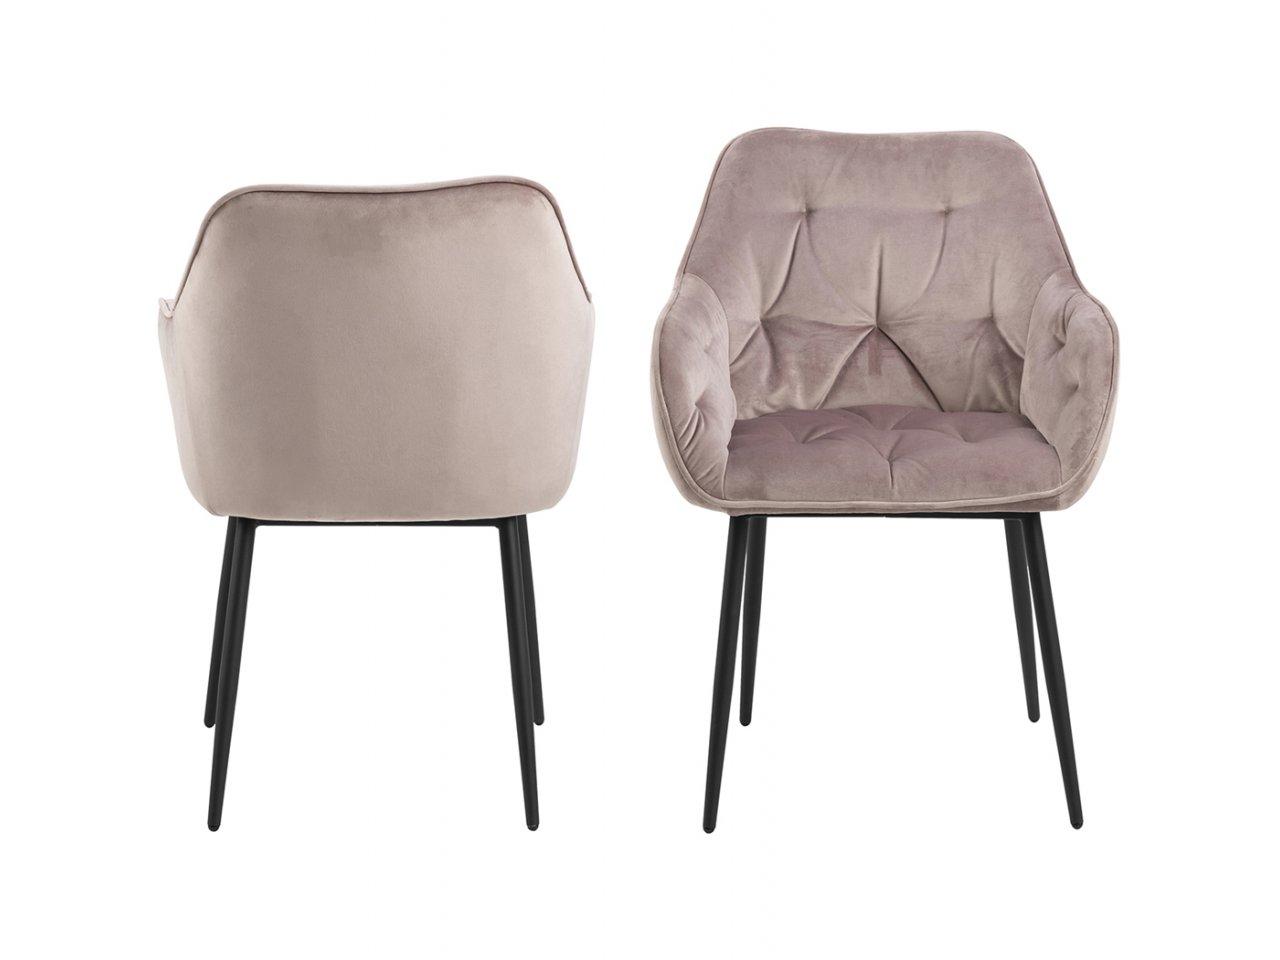 Sedia con braccioli Poffabro - v13